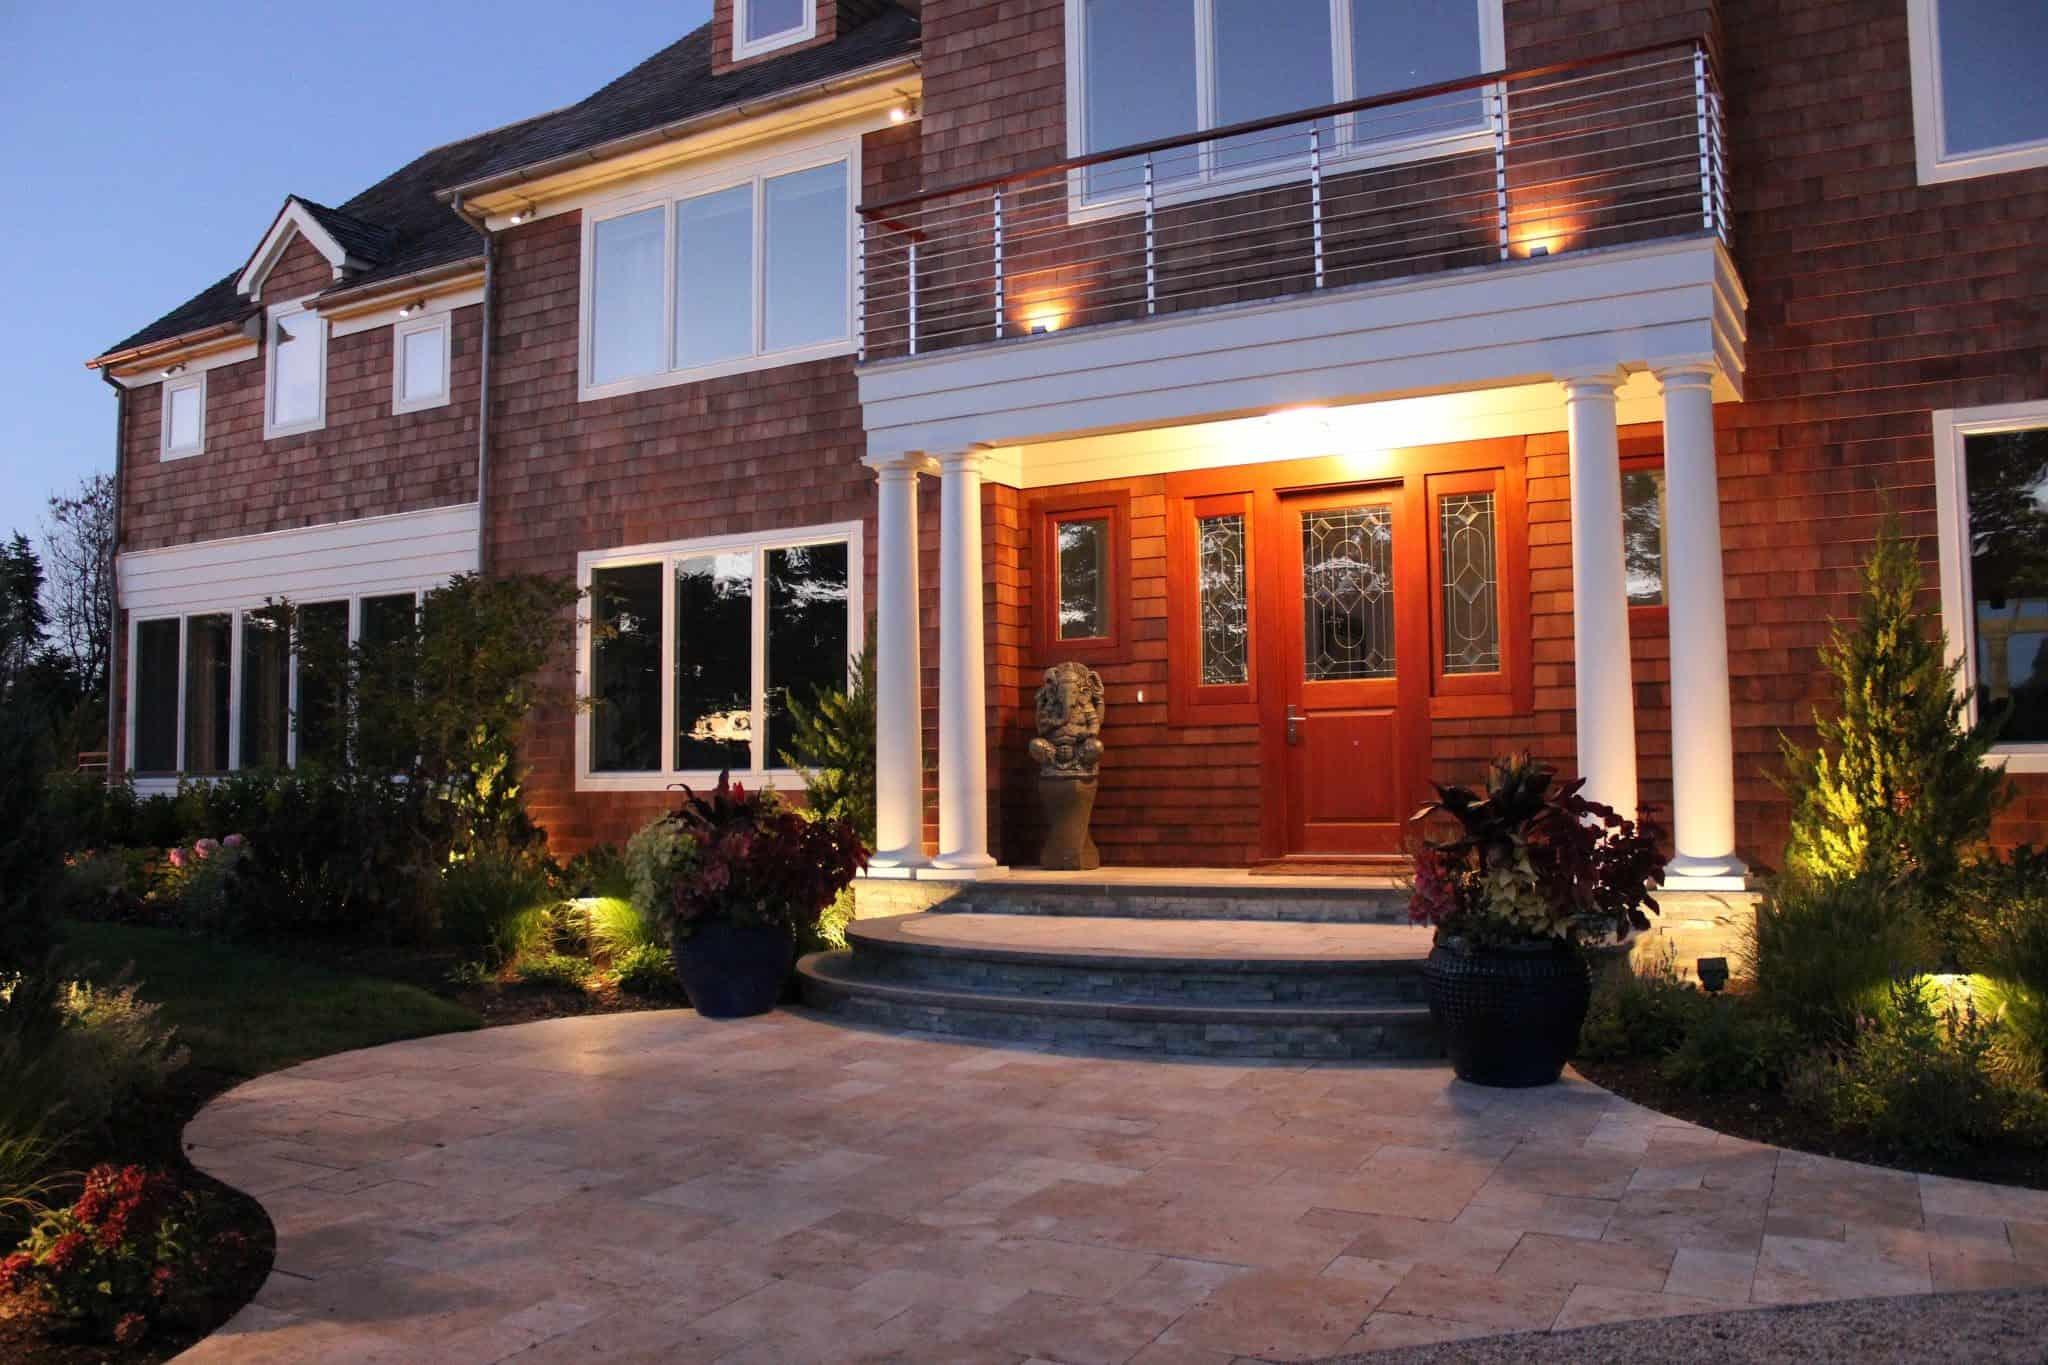 36 inch Glazed Diamond Pottery planted with Coleus, Tie, and Verbena - Southampton, Long Island NY